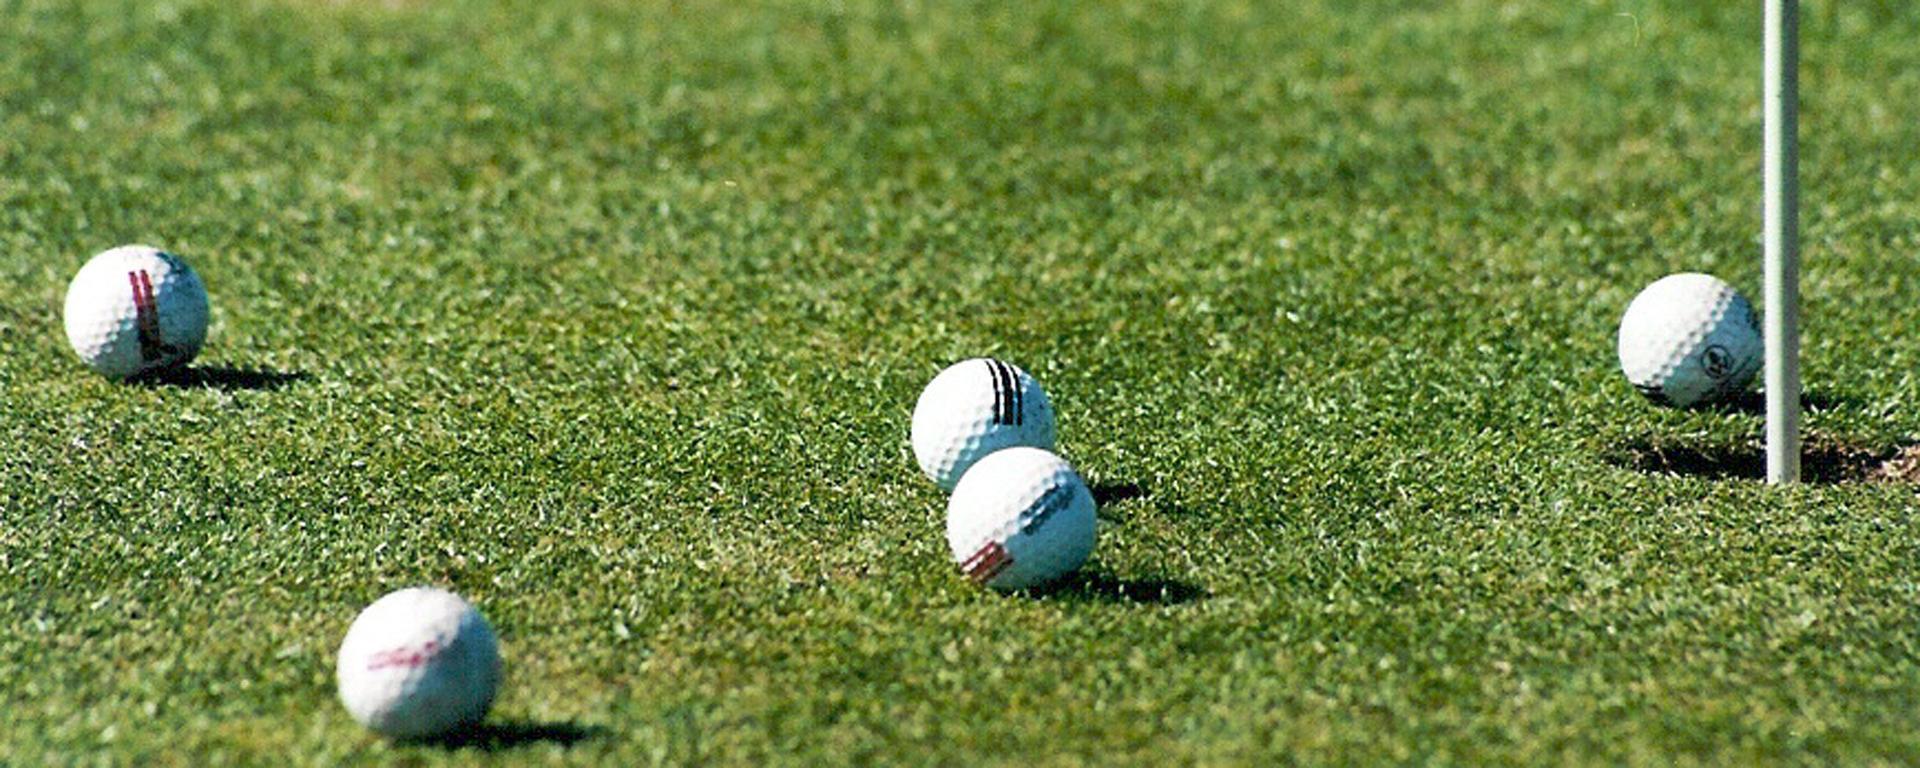 Golf balls on a putting green